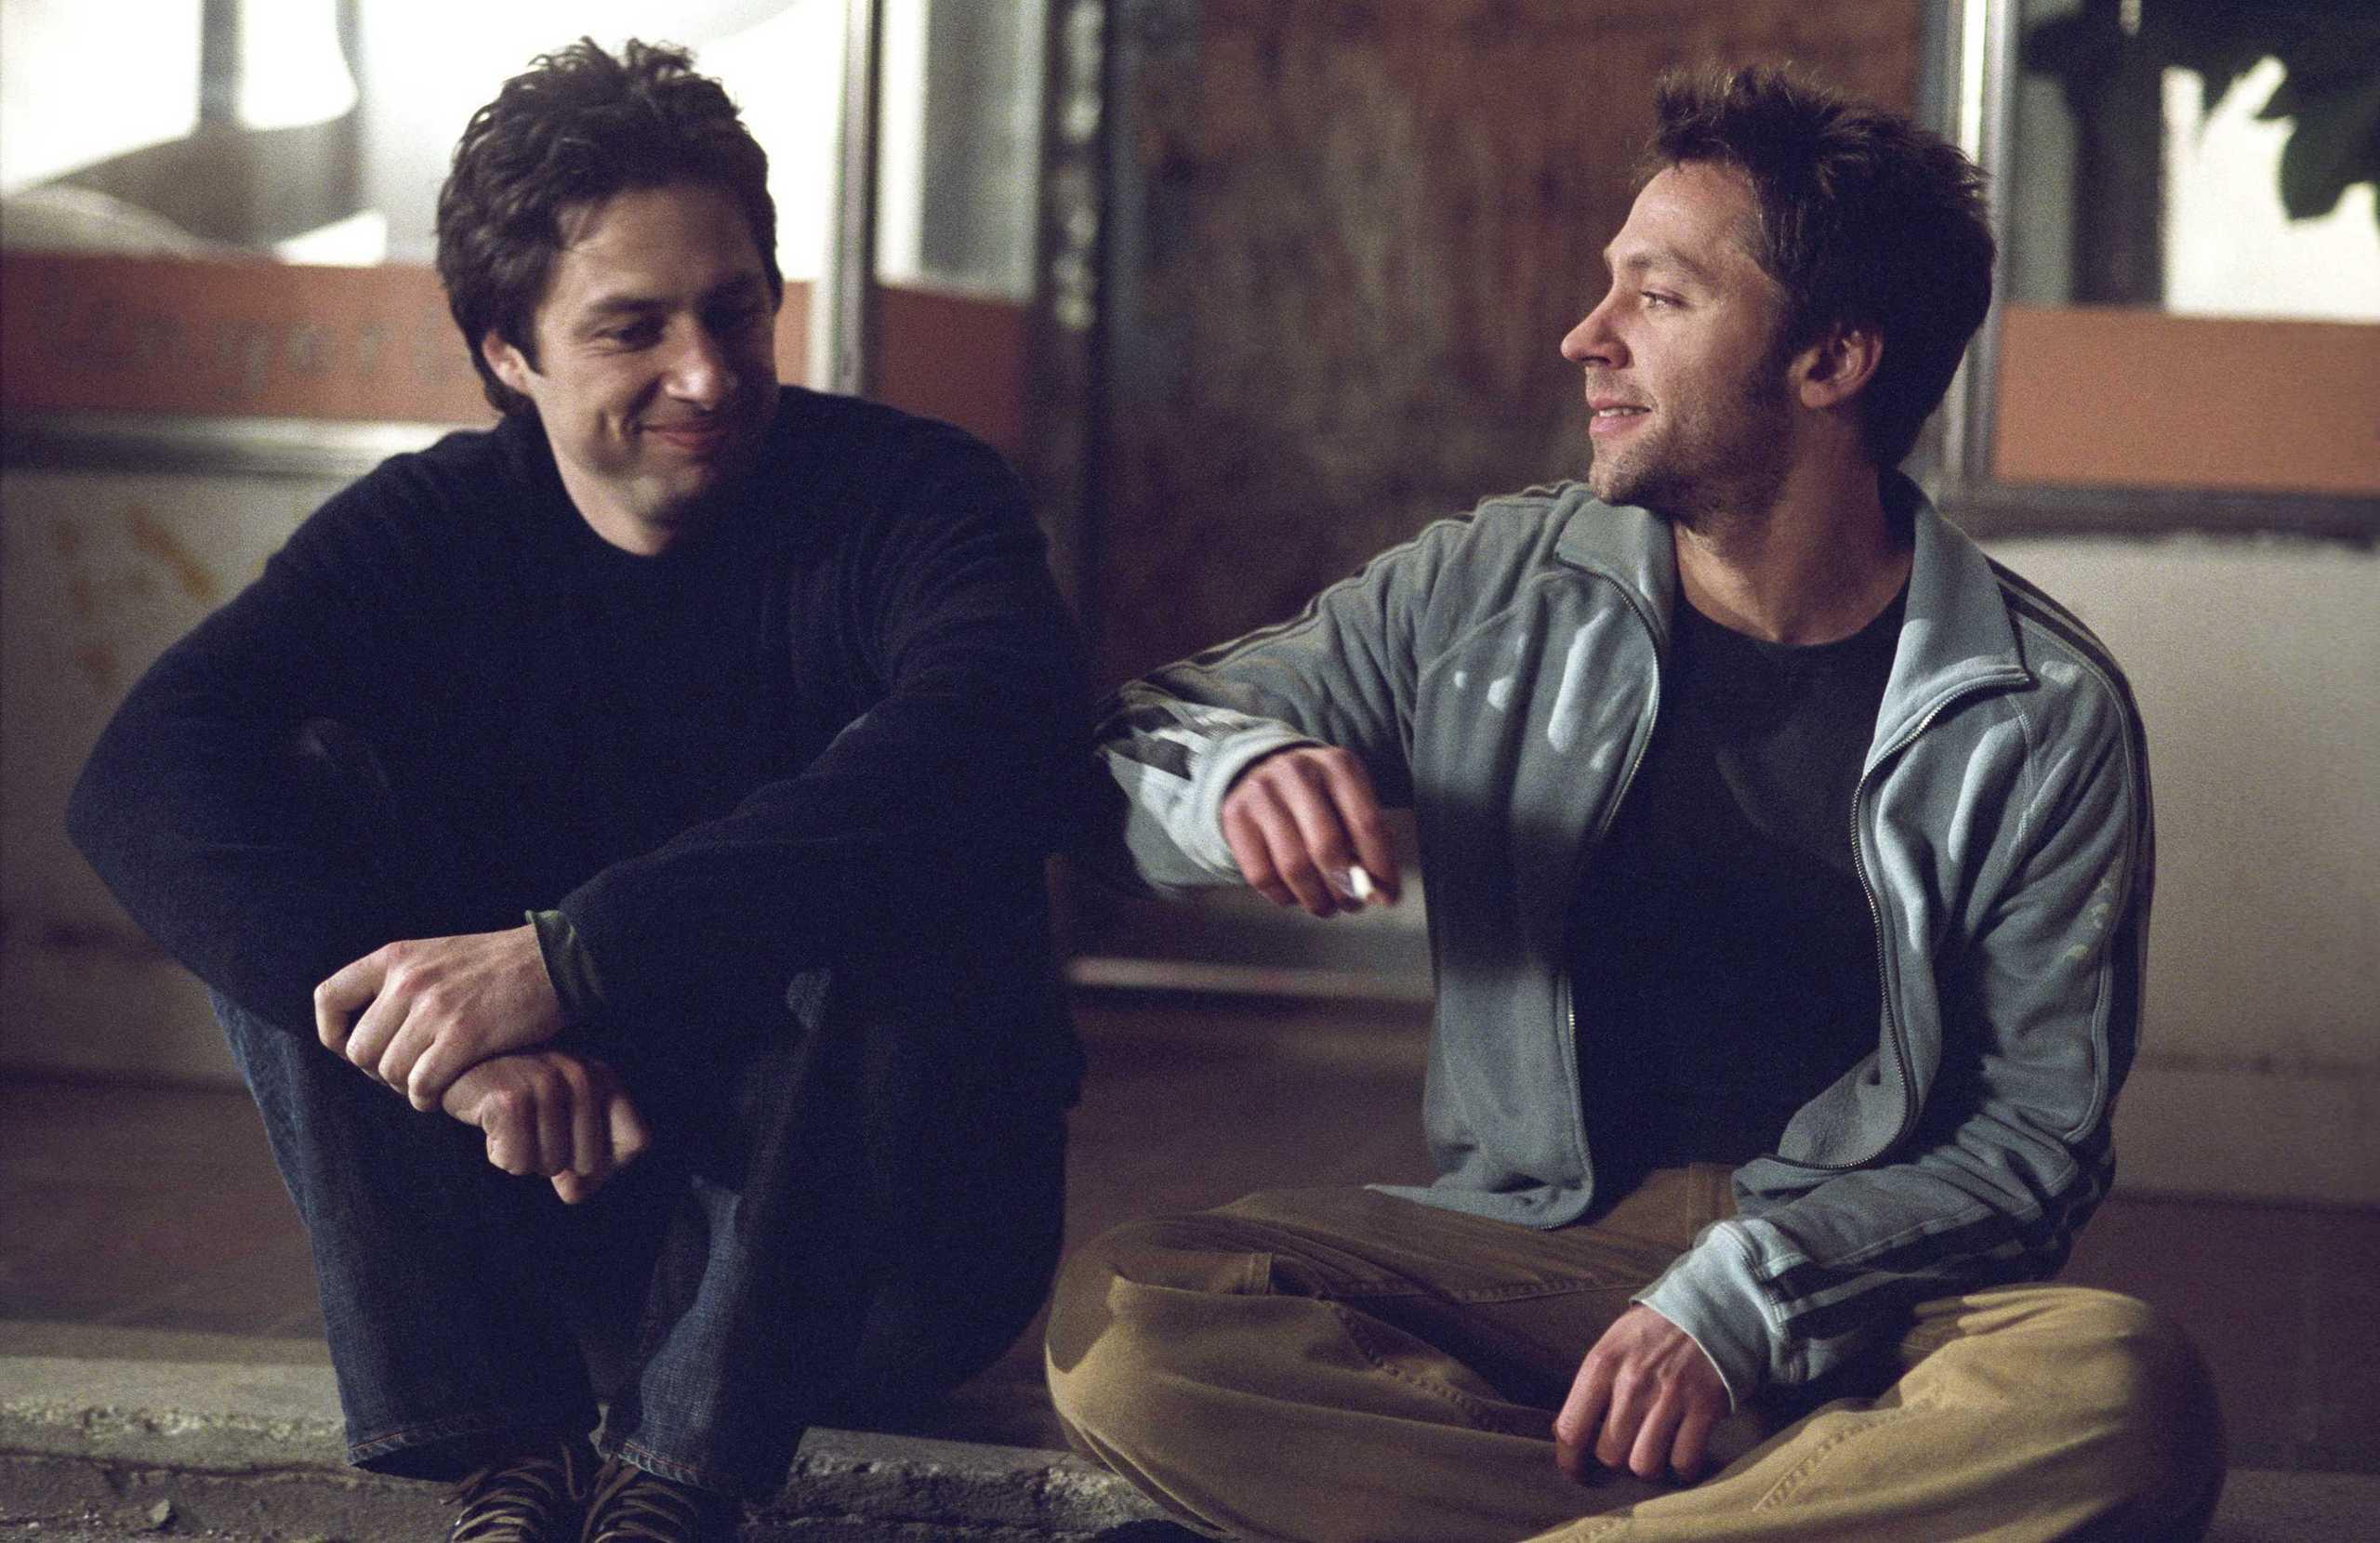 Zach Braff & Michael in The Last Kiss